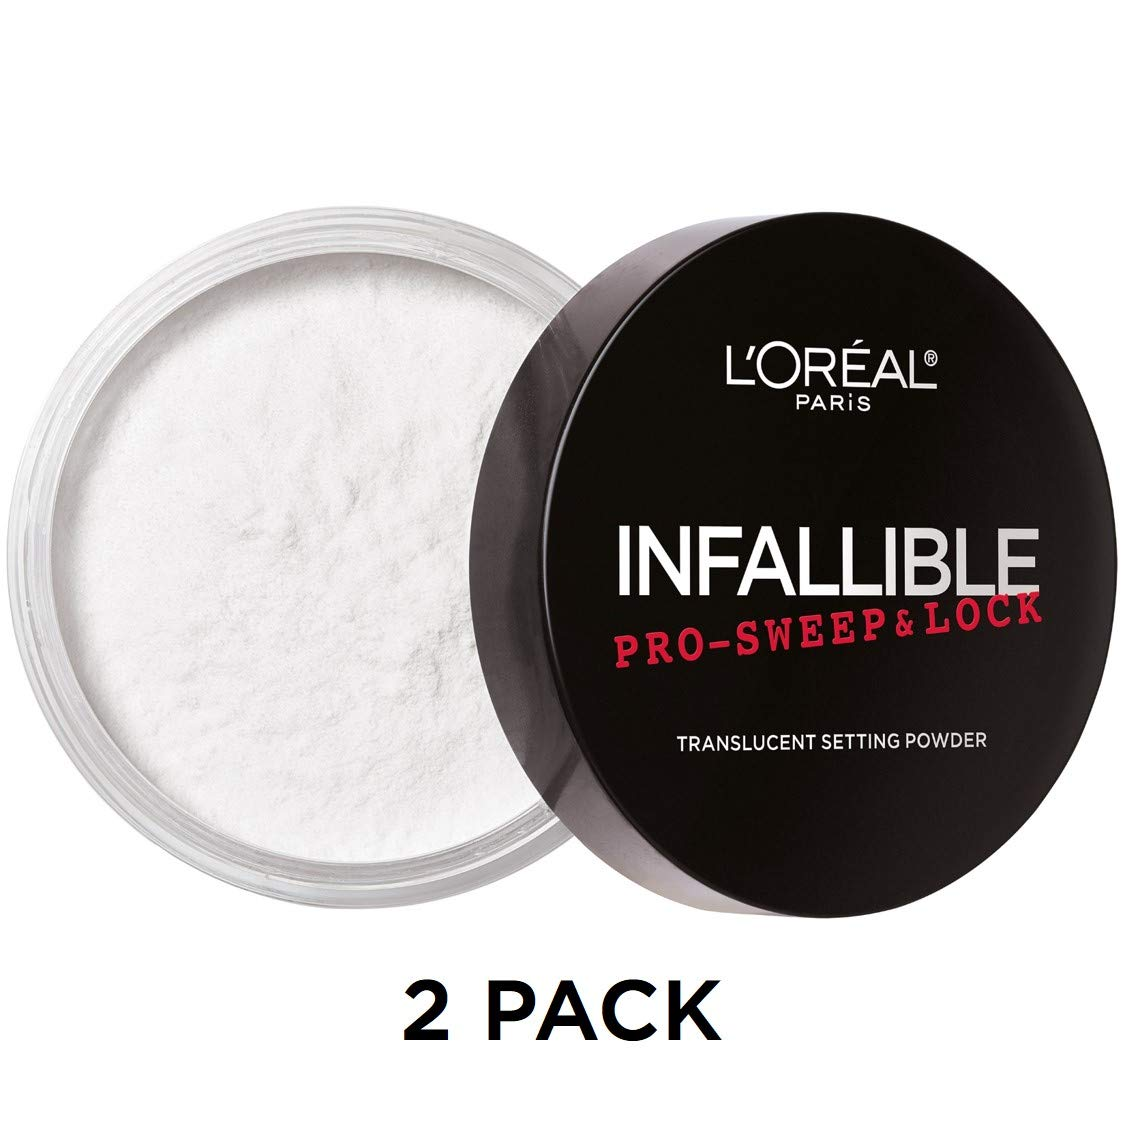 L'Oreal Paris Makeup Infallible Pro Sweep & Lock Loose Setting Powder, Translucent, 2 Count